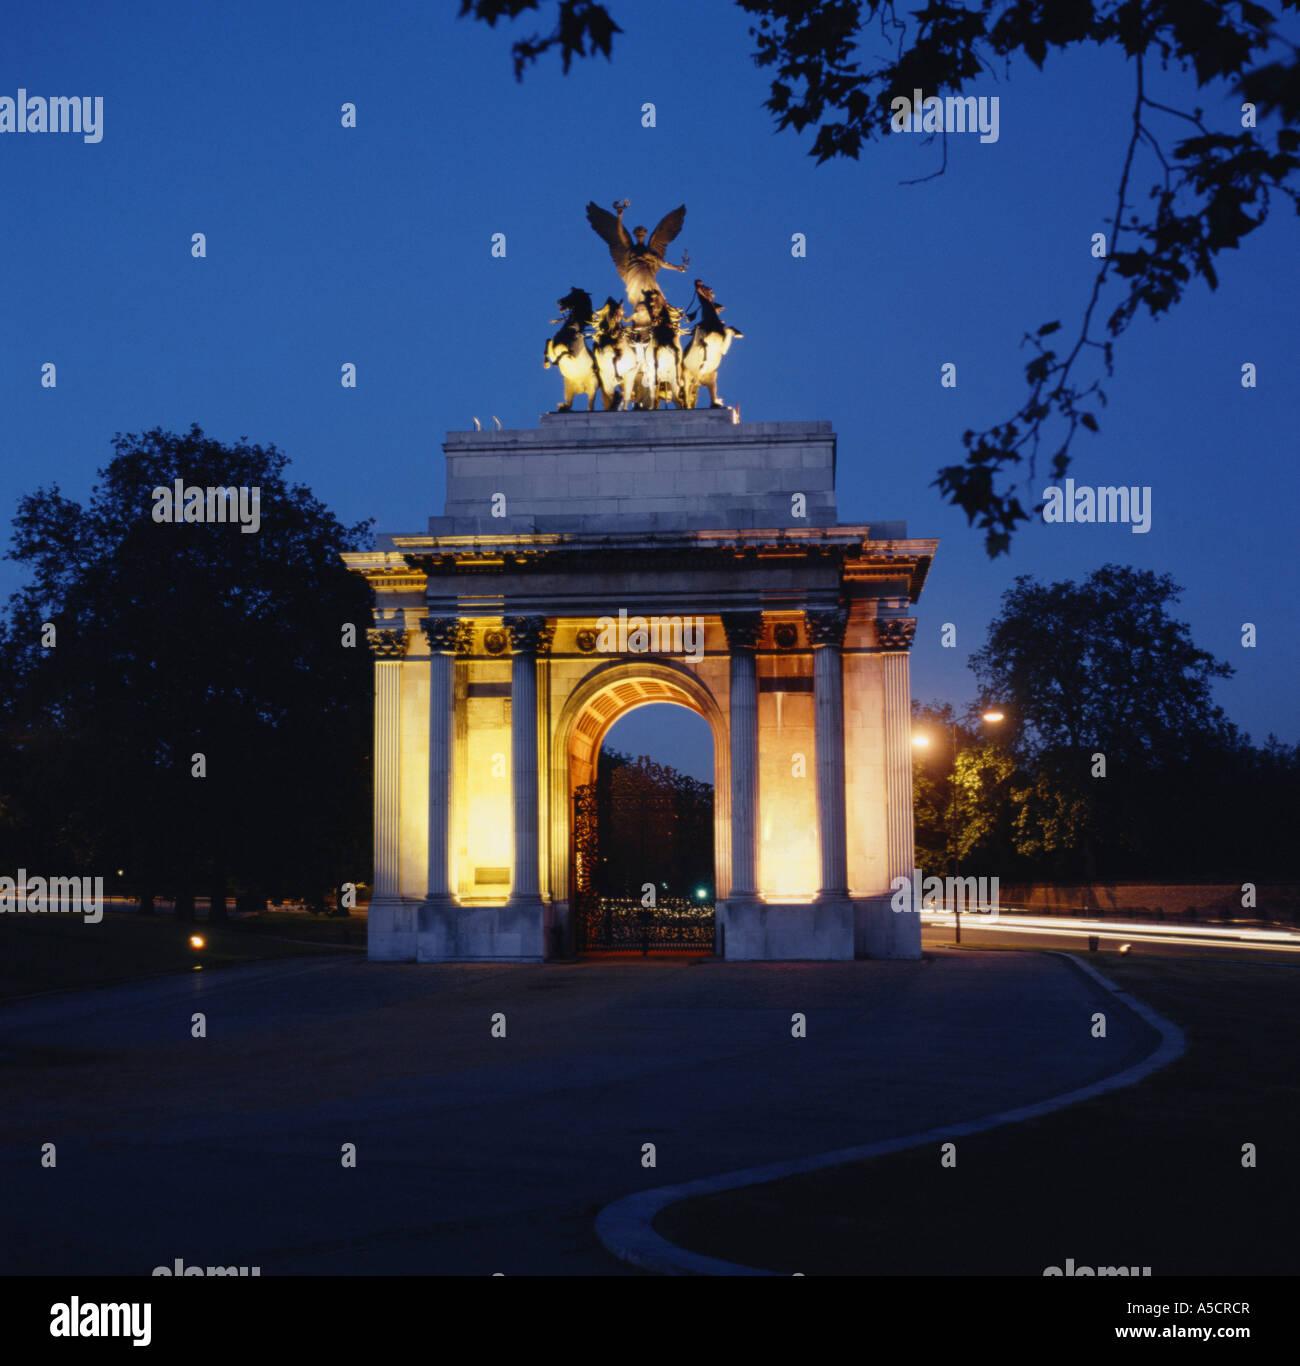 Wellington Arch, Hyde Park Corner, London, England, UK - Stock Image